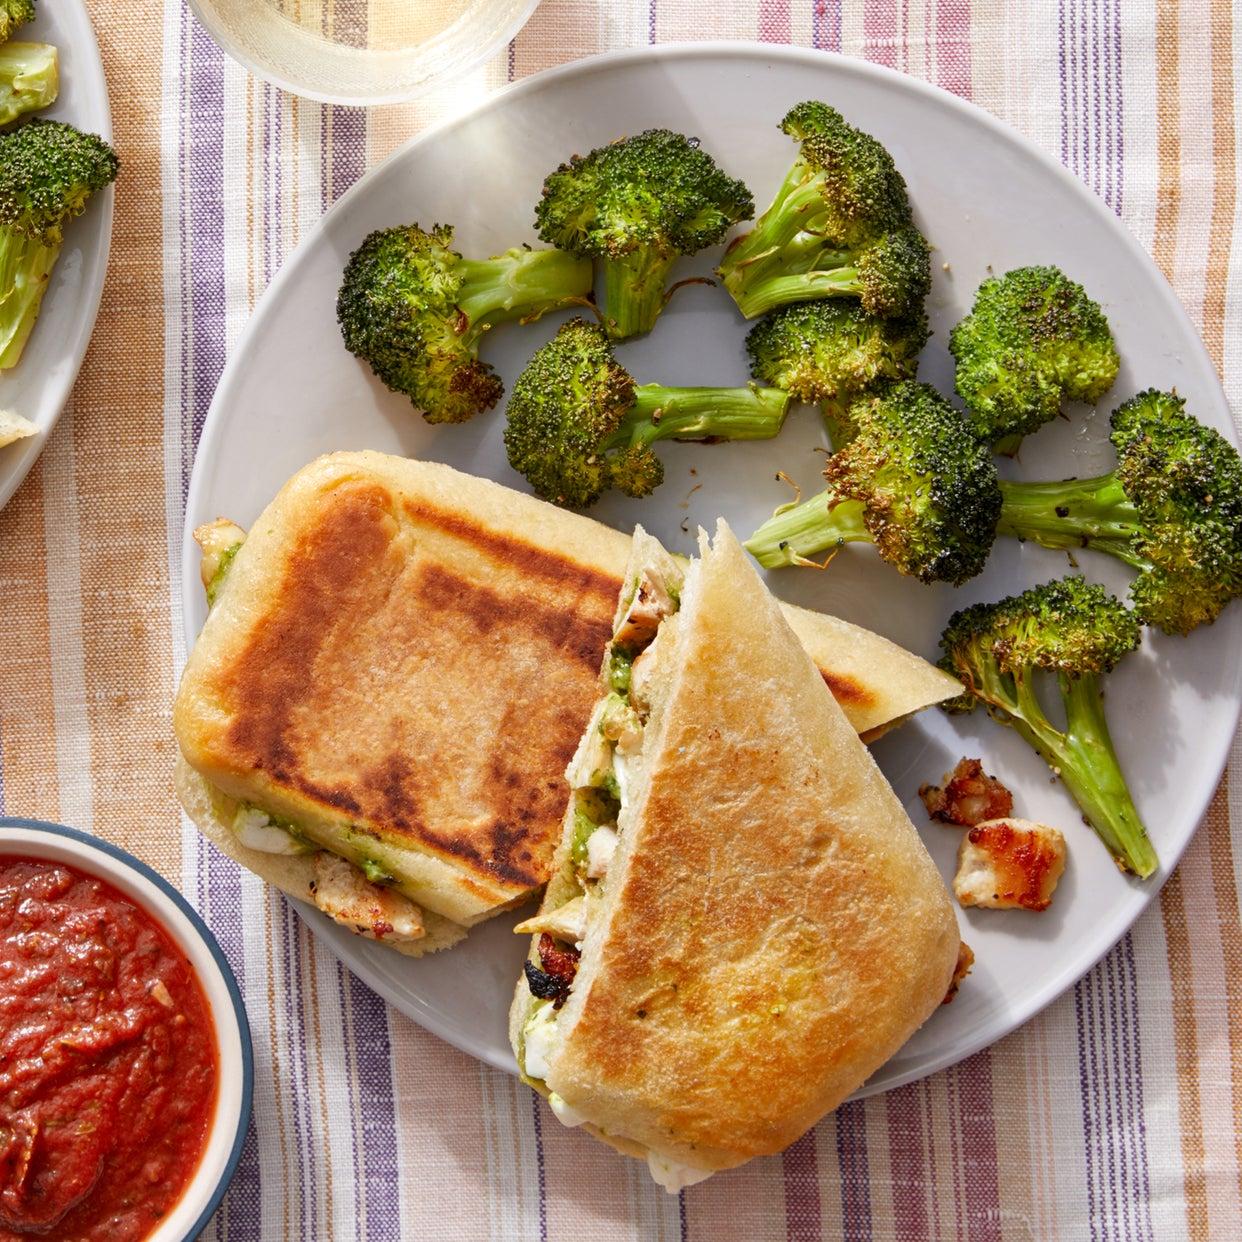 Turkey, Mozzarella, & Pesto Paninis with Roasted Broccoli